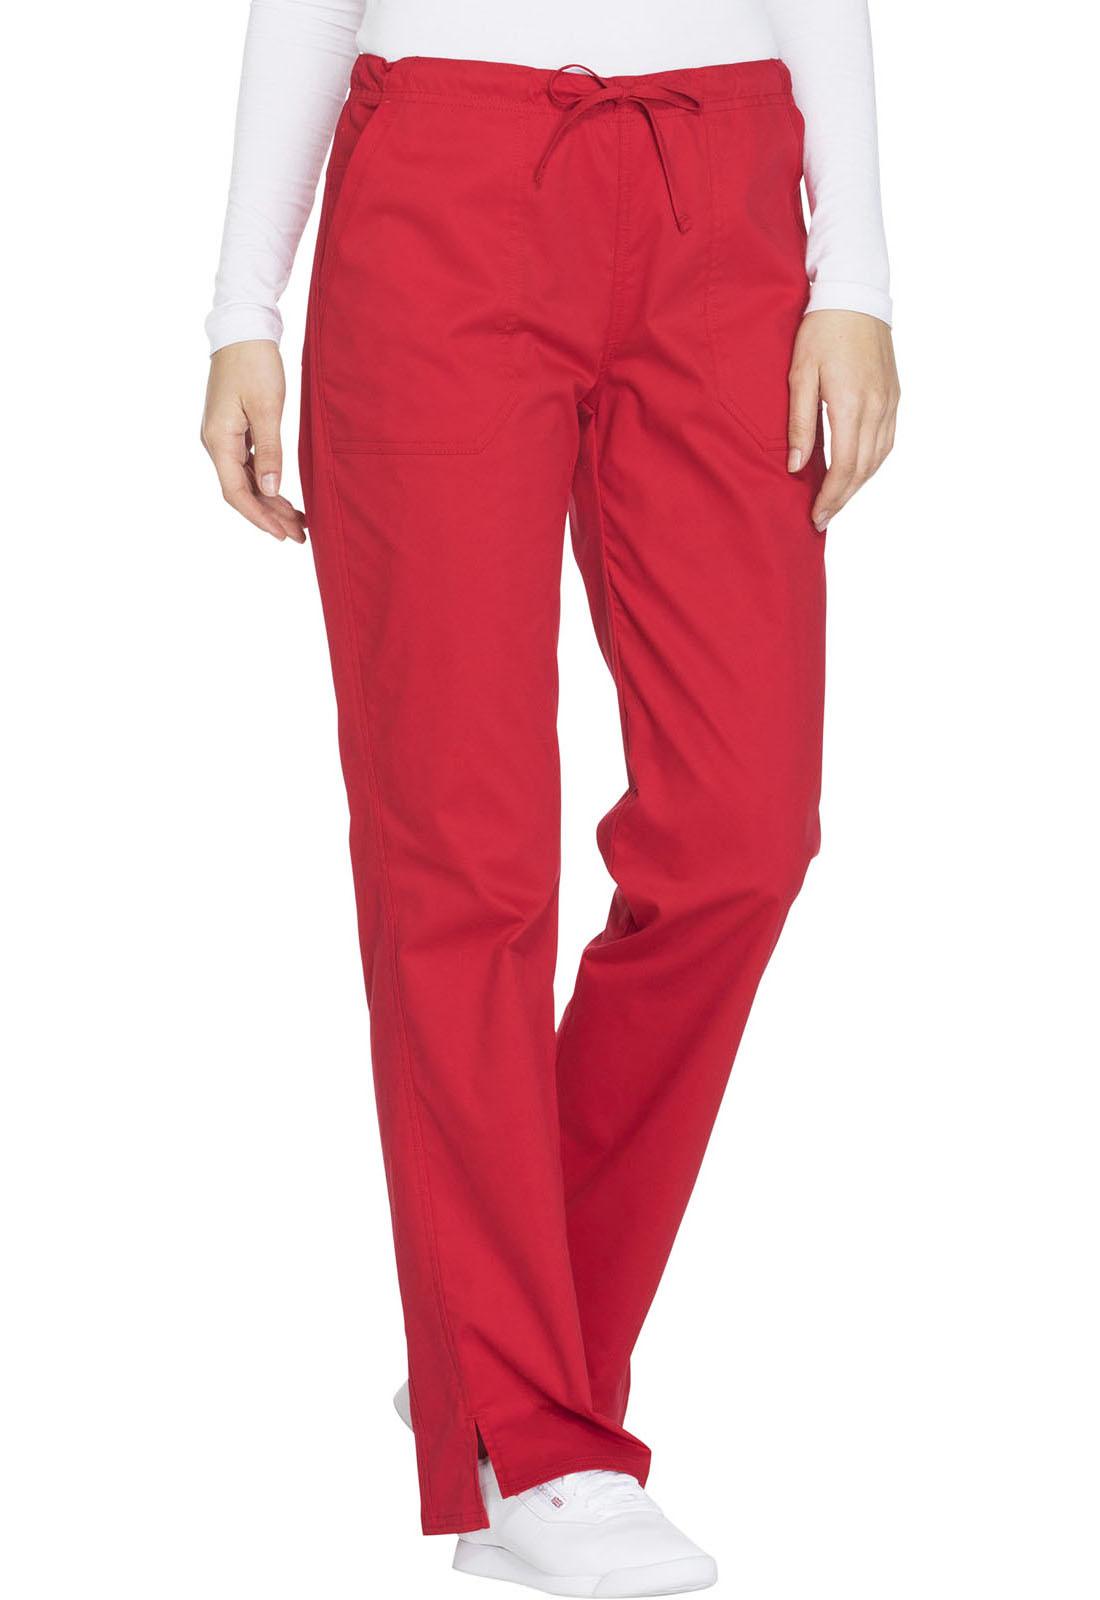 8e97ac542c0 WW Core Stretch Mid Rise Straight Leg Drawstring Pant in Red WW130T-REDW  from DASCO Reid Uniform & Shoes